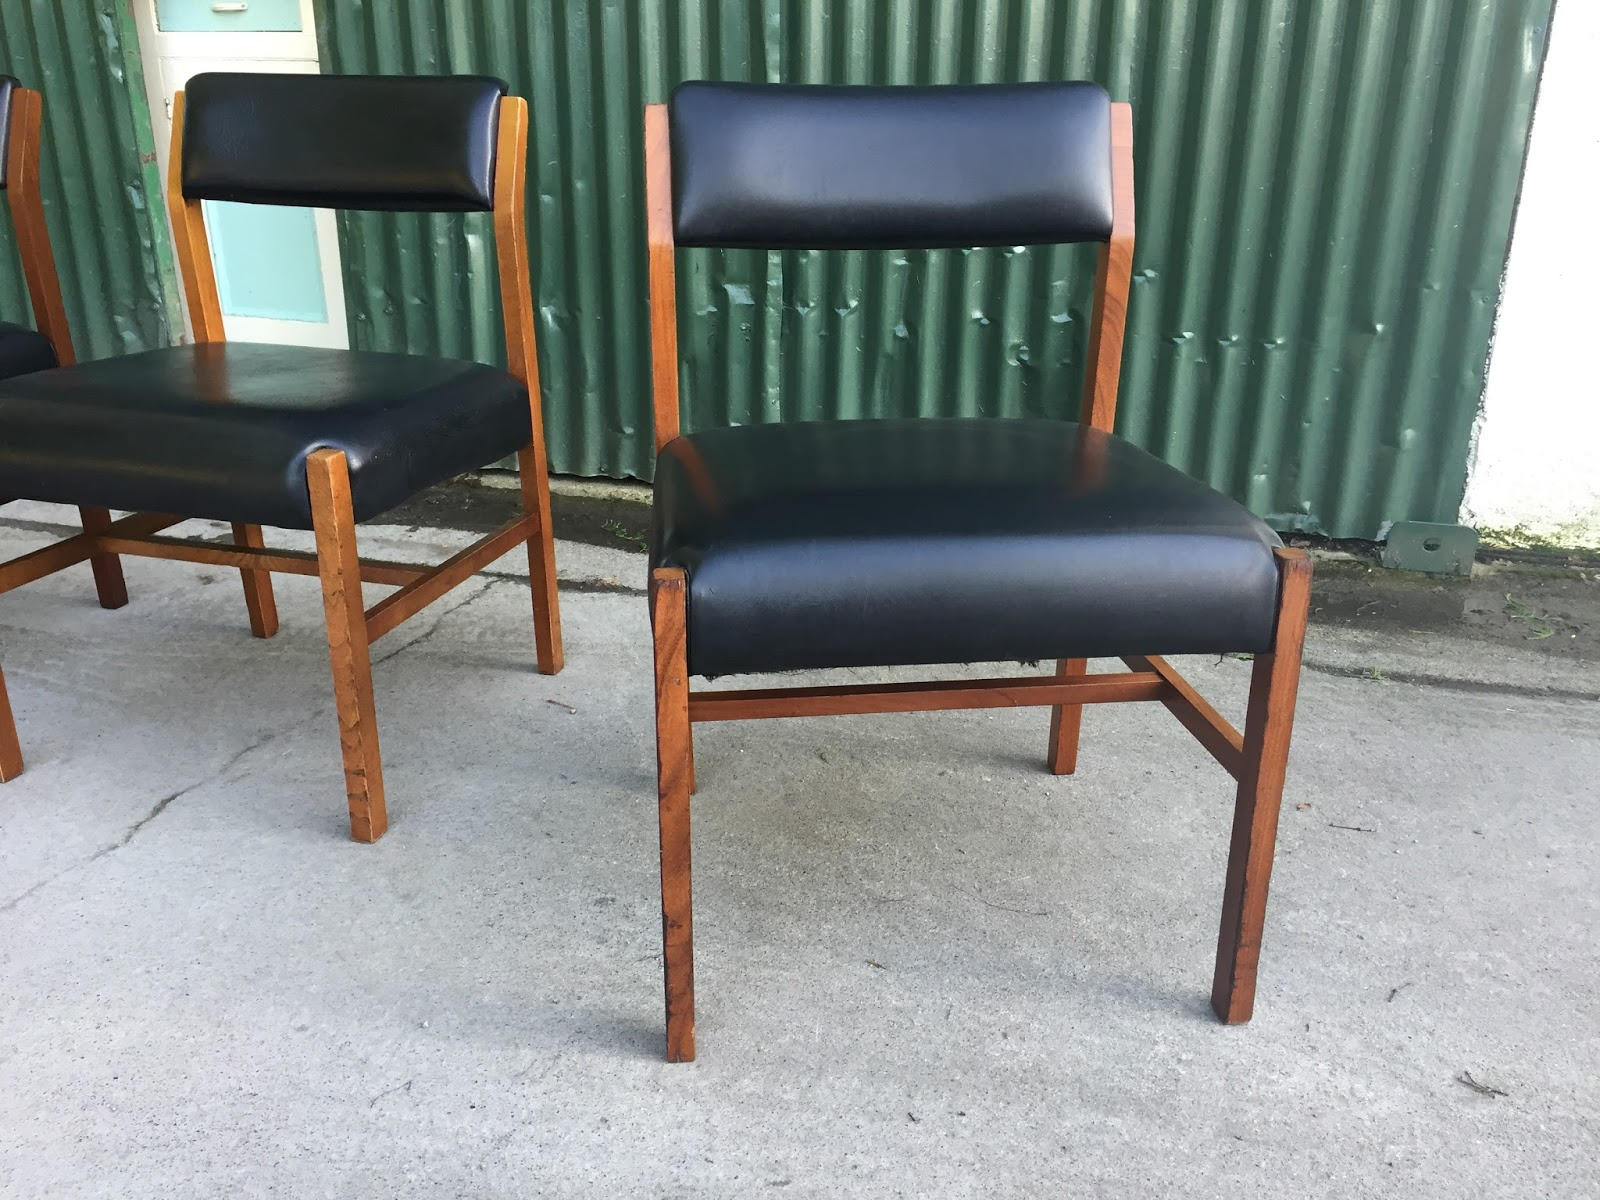 Retro Dining Chairs Ireland Adirondack Wine Barrel Ocd Vintage Furniture